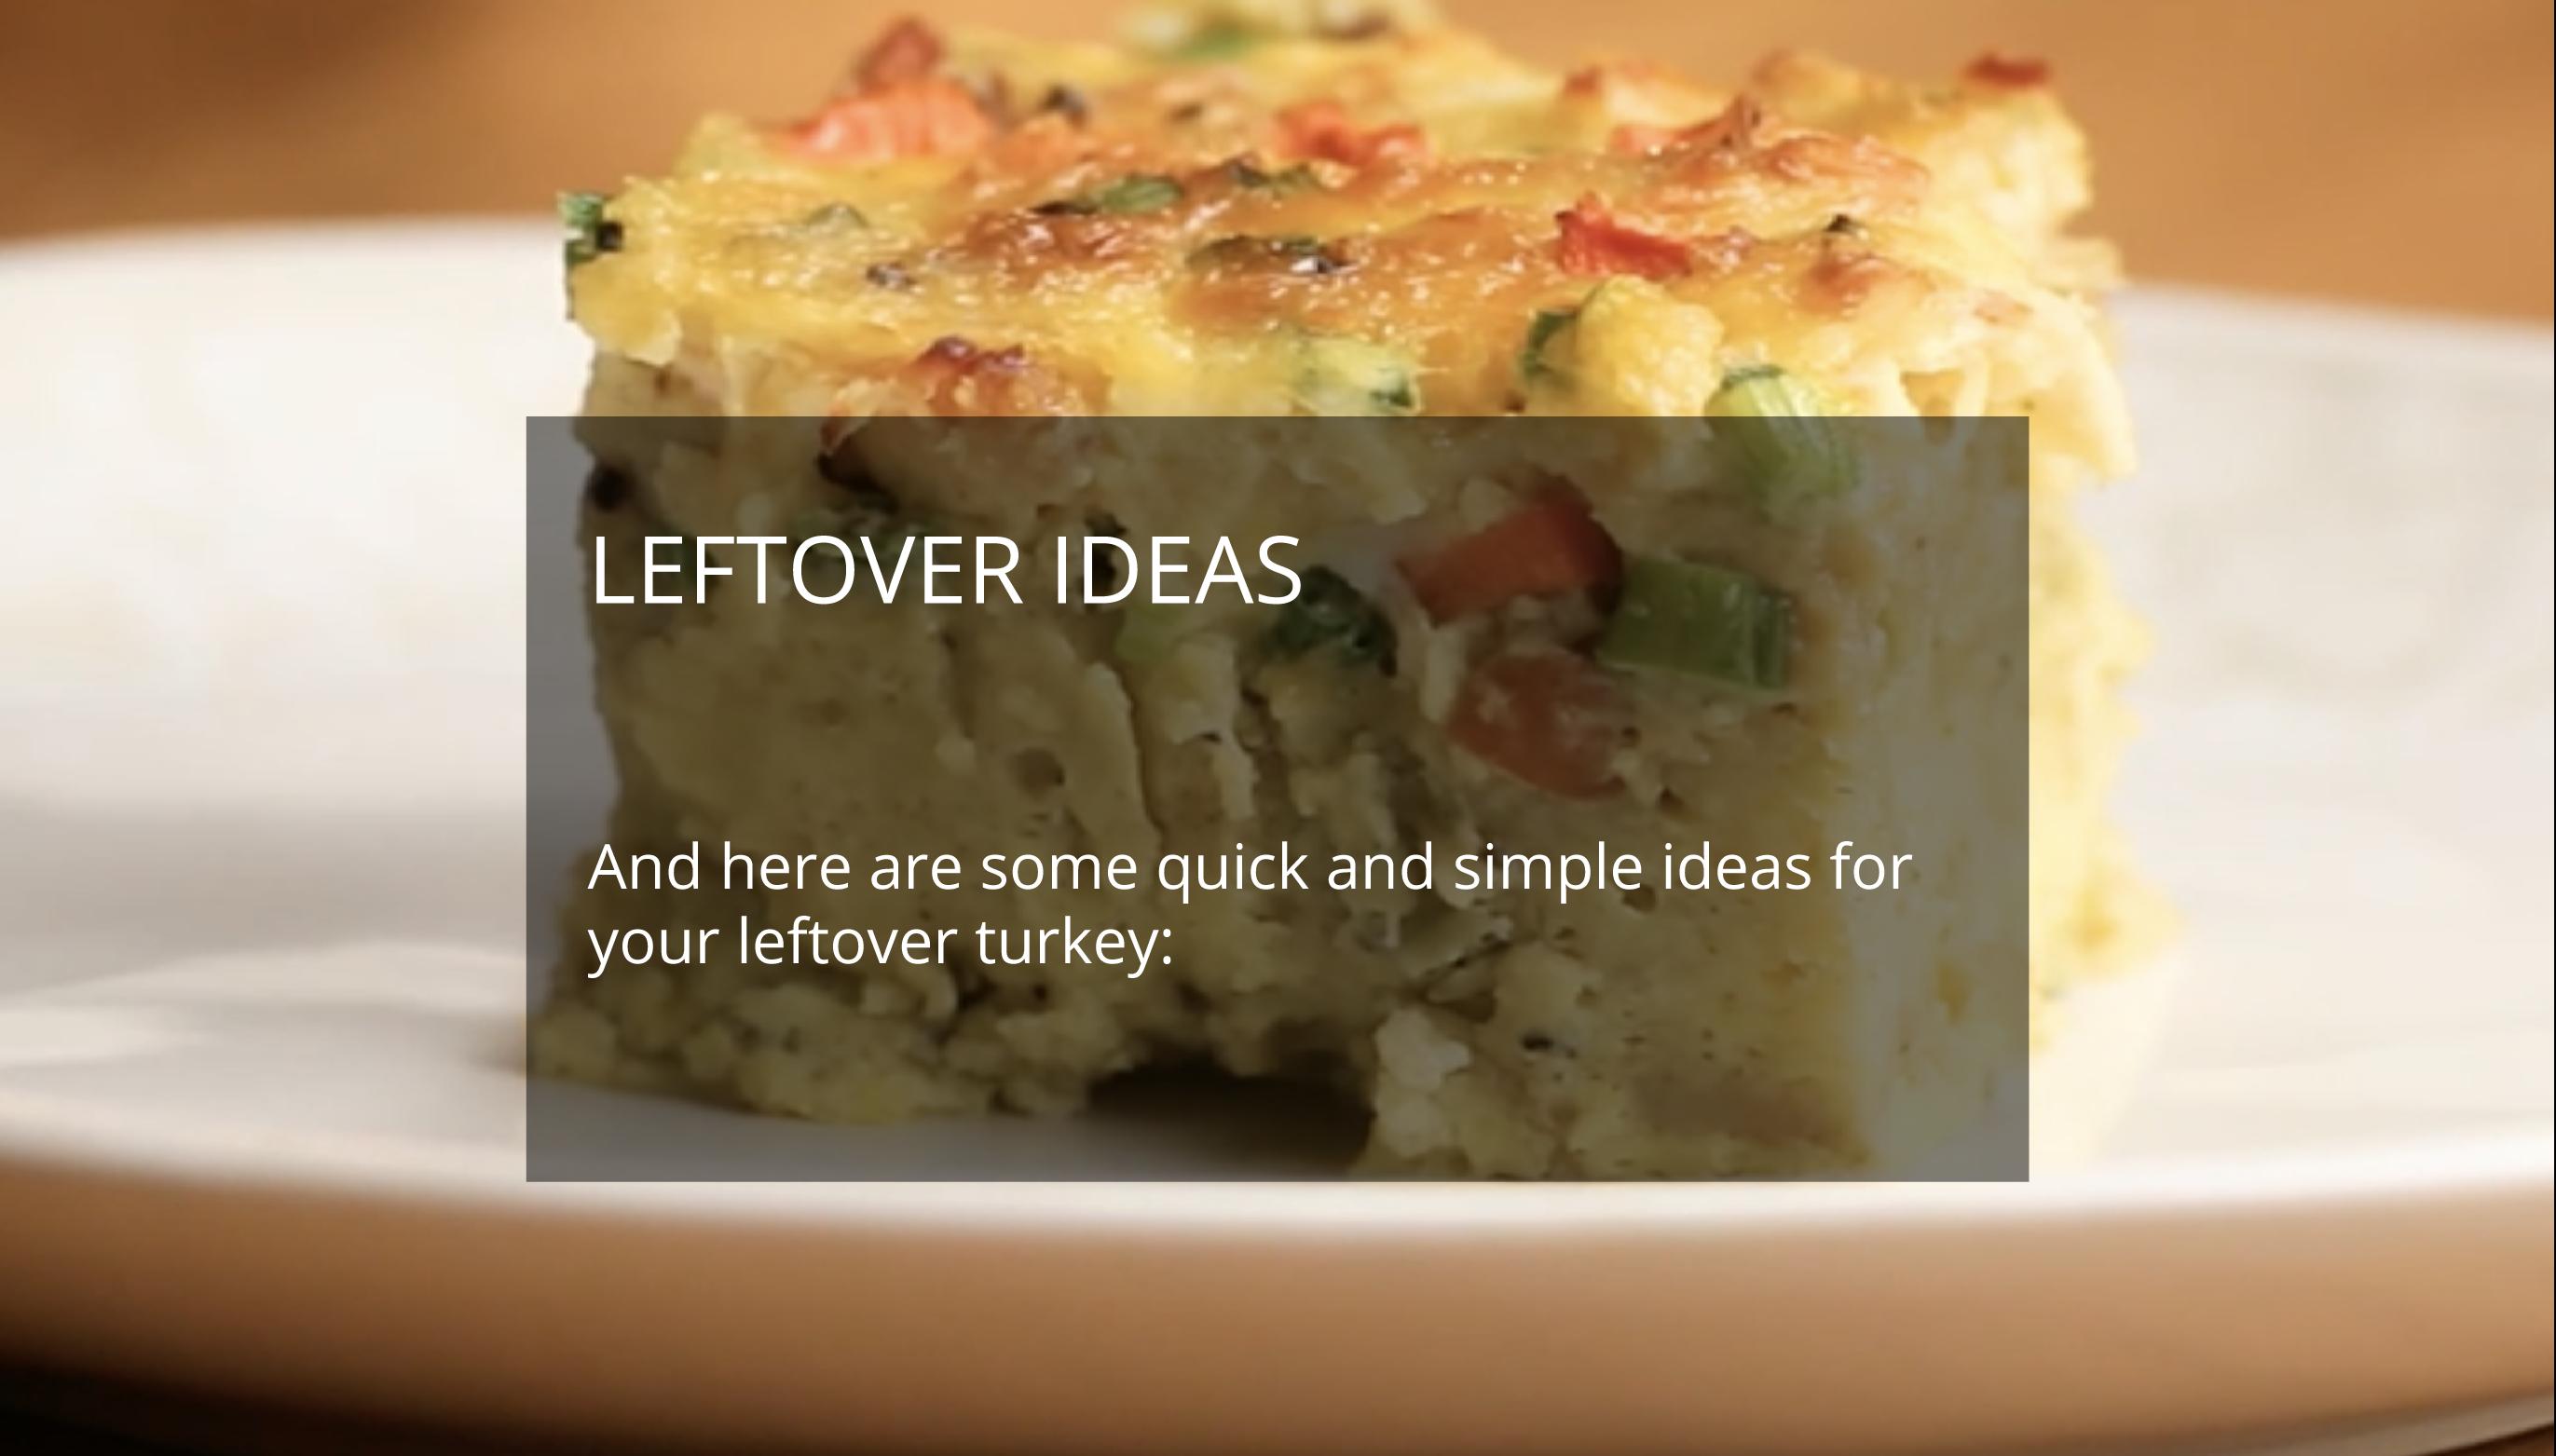 Leftover Ideas